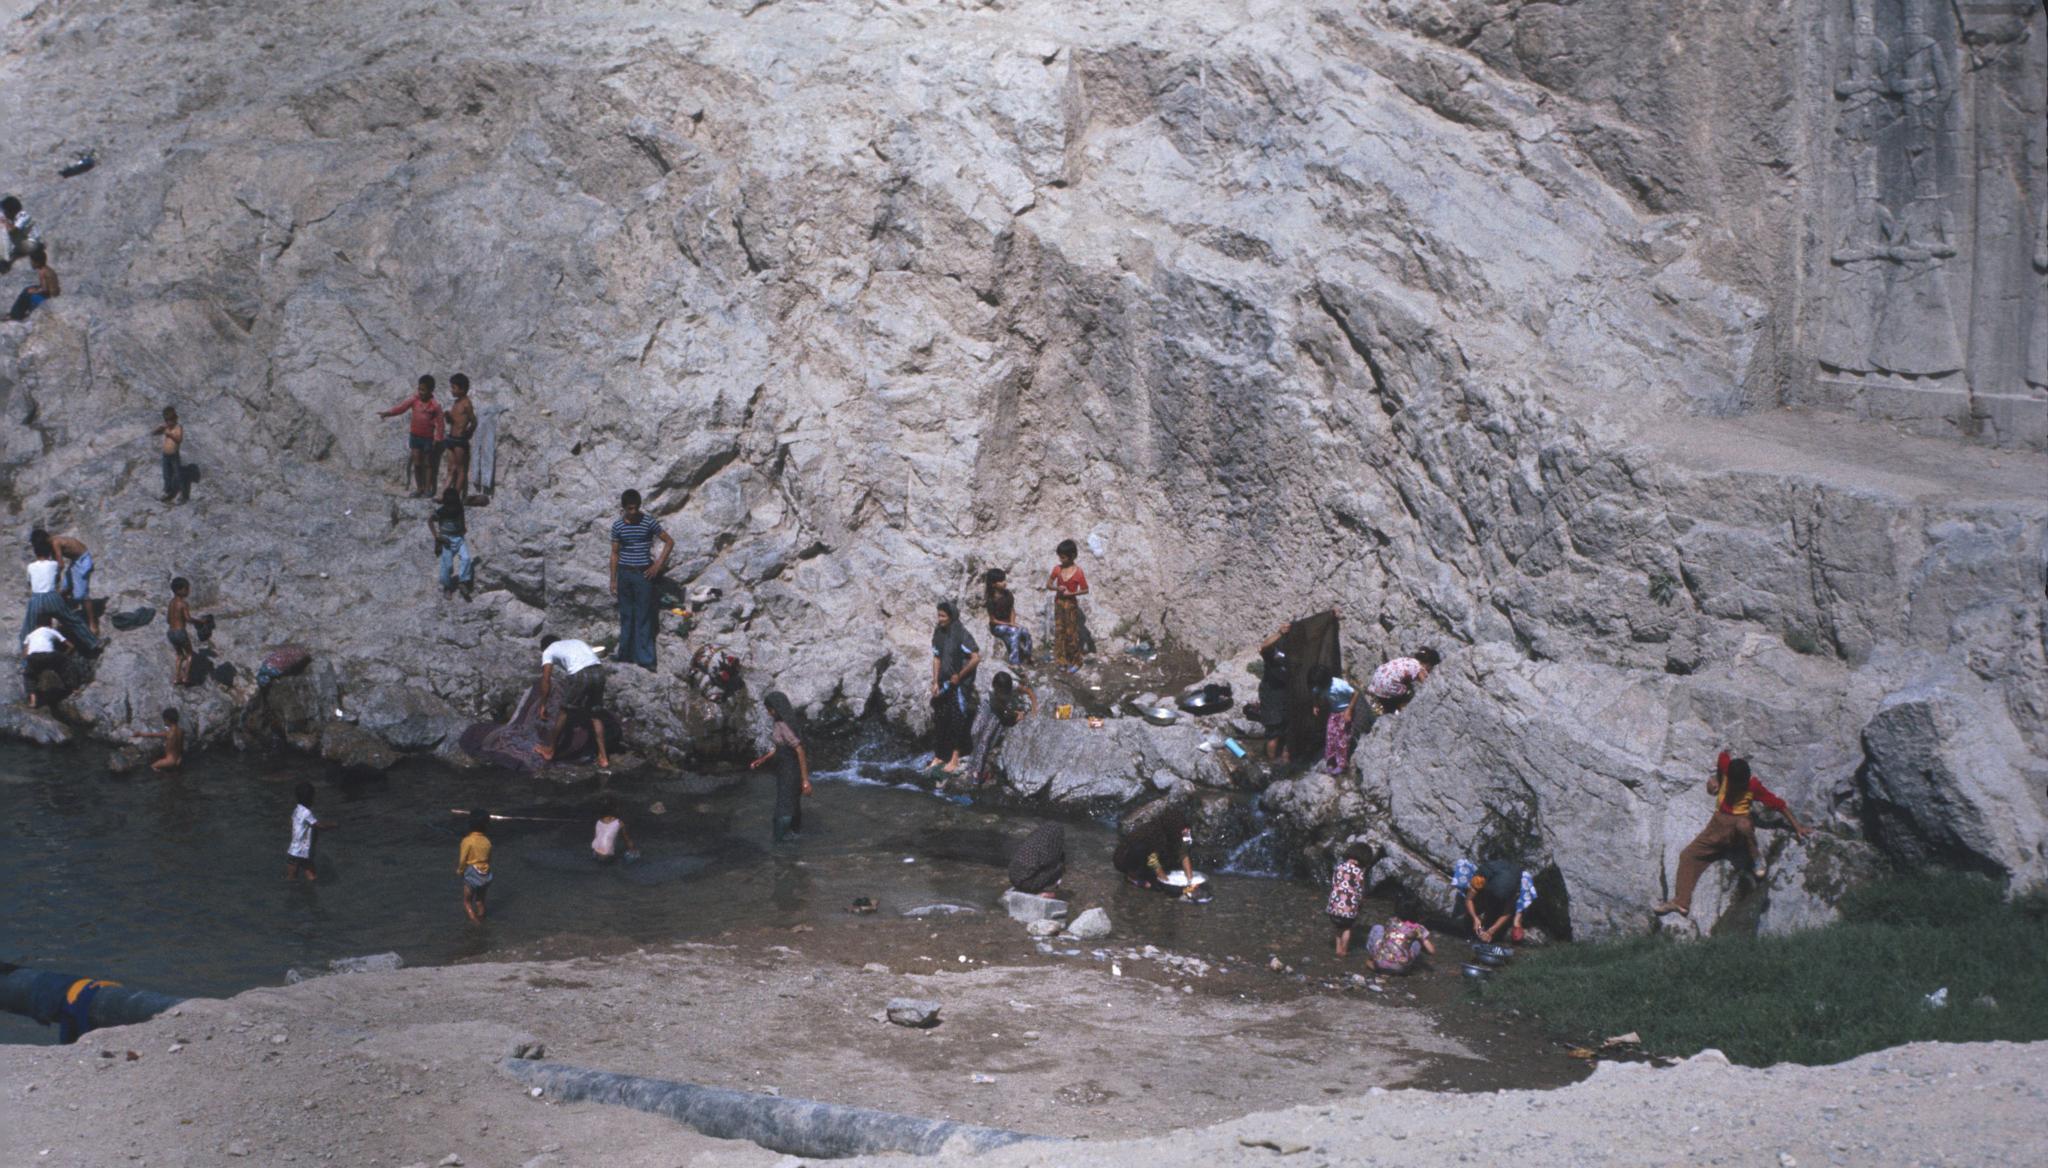 Carpet Washing - Rey, Iran Circa 1975/6 by escargo2k